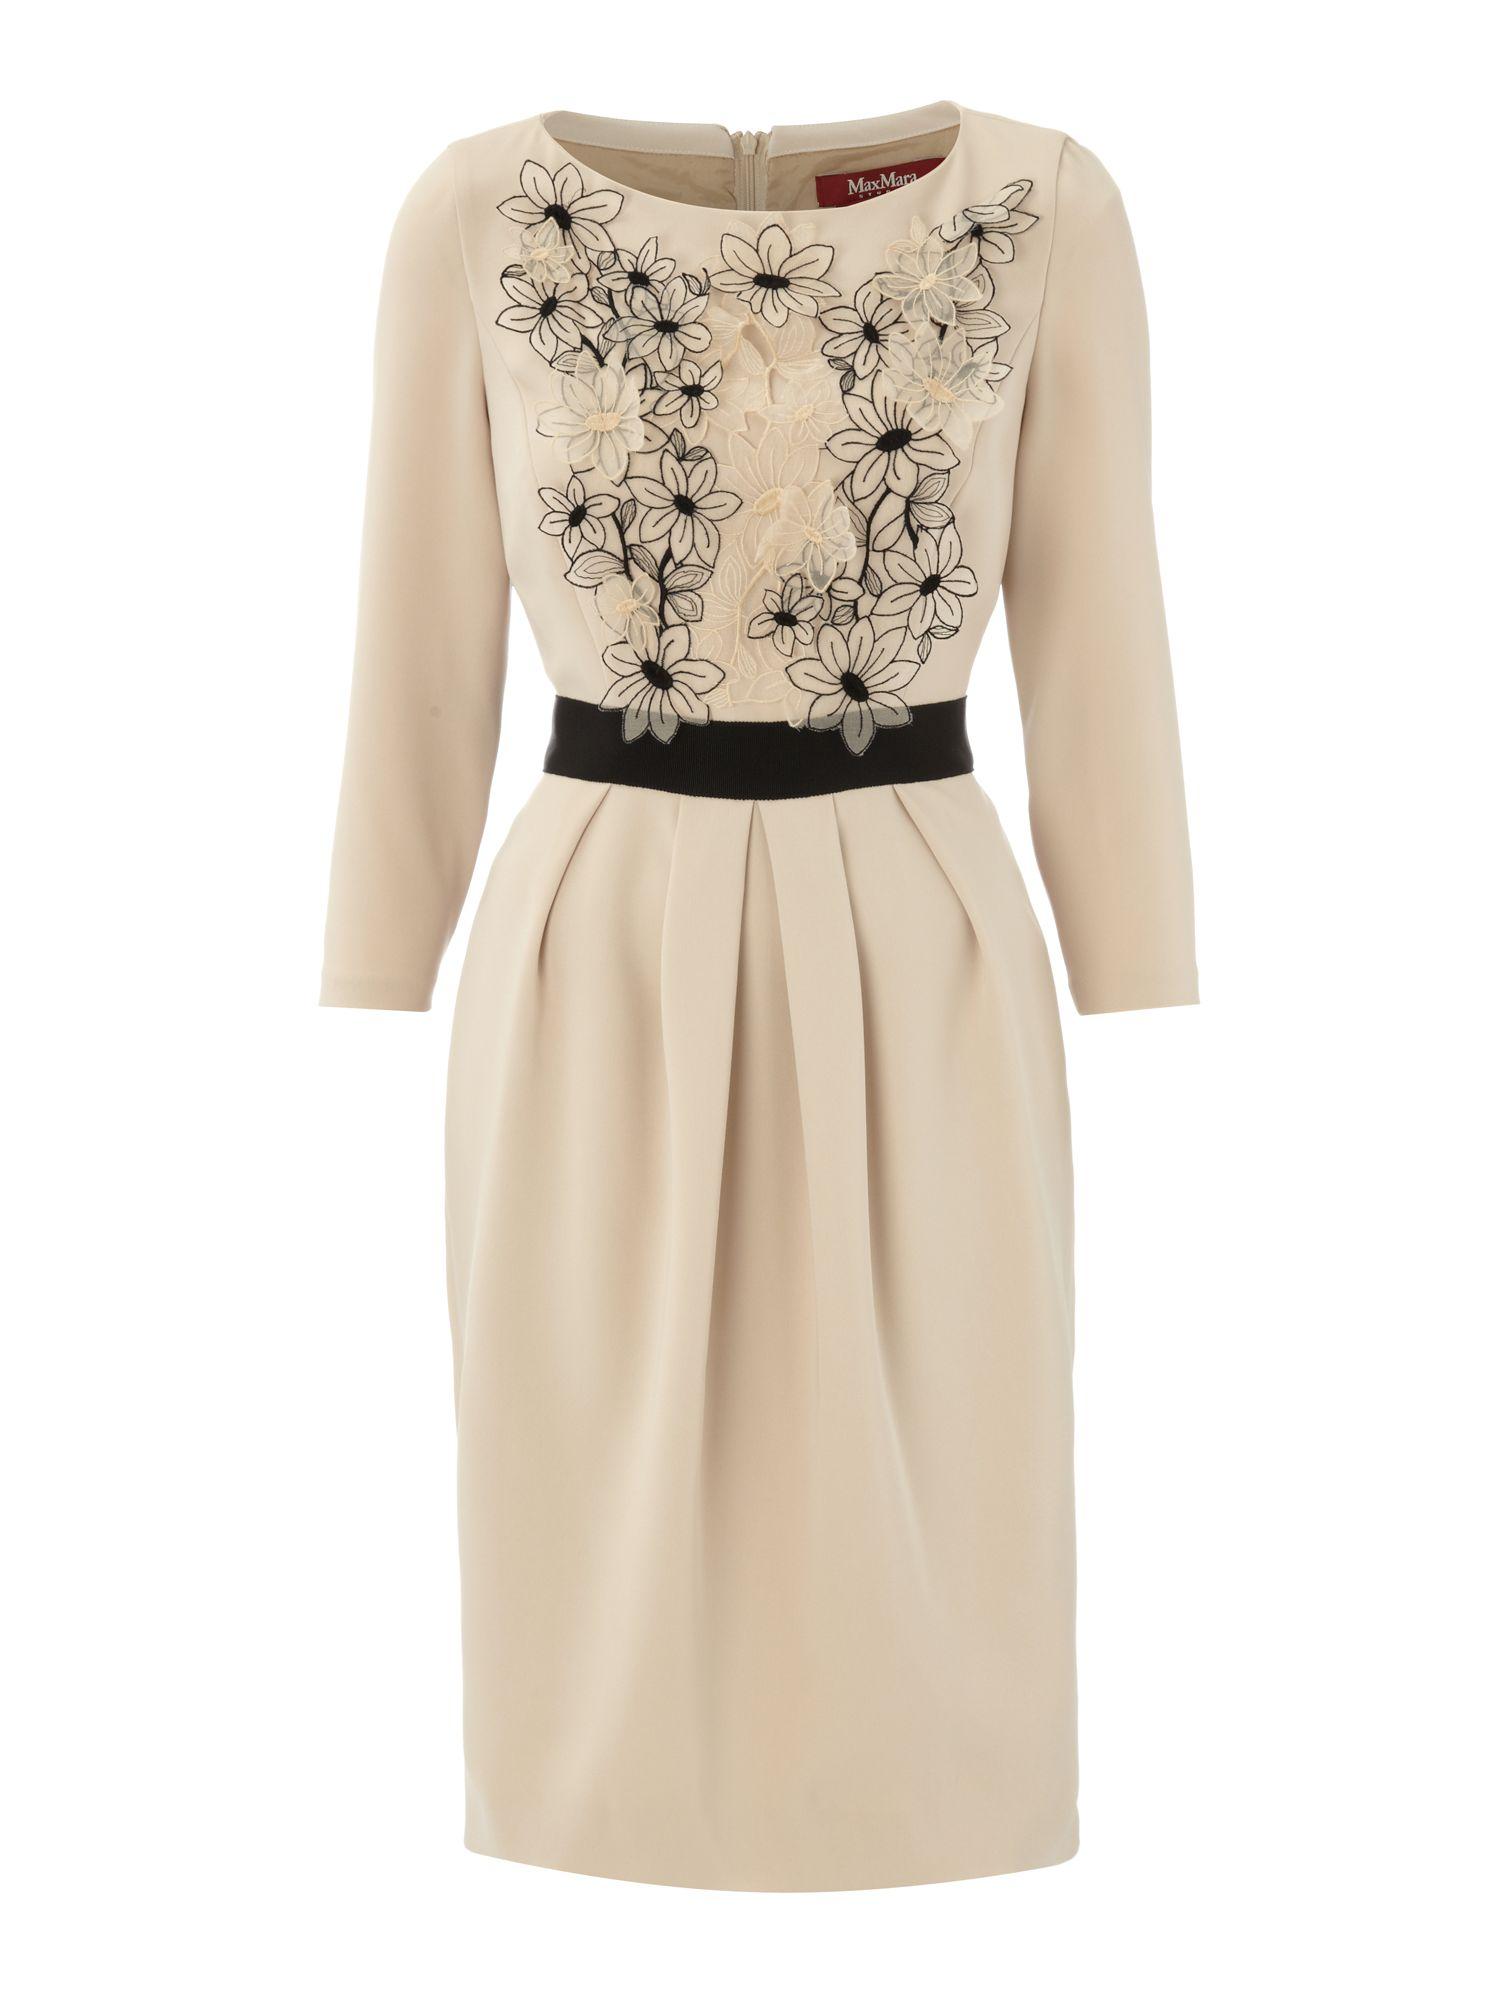 max mara studio gelada embroidered dress in beige cream. Black Bedroom Furniture Sets. Home Design Ideas